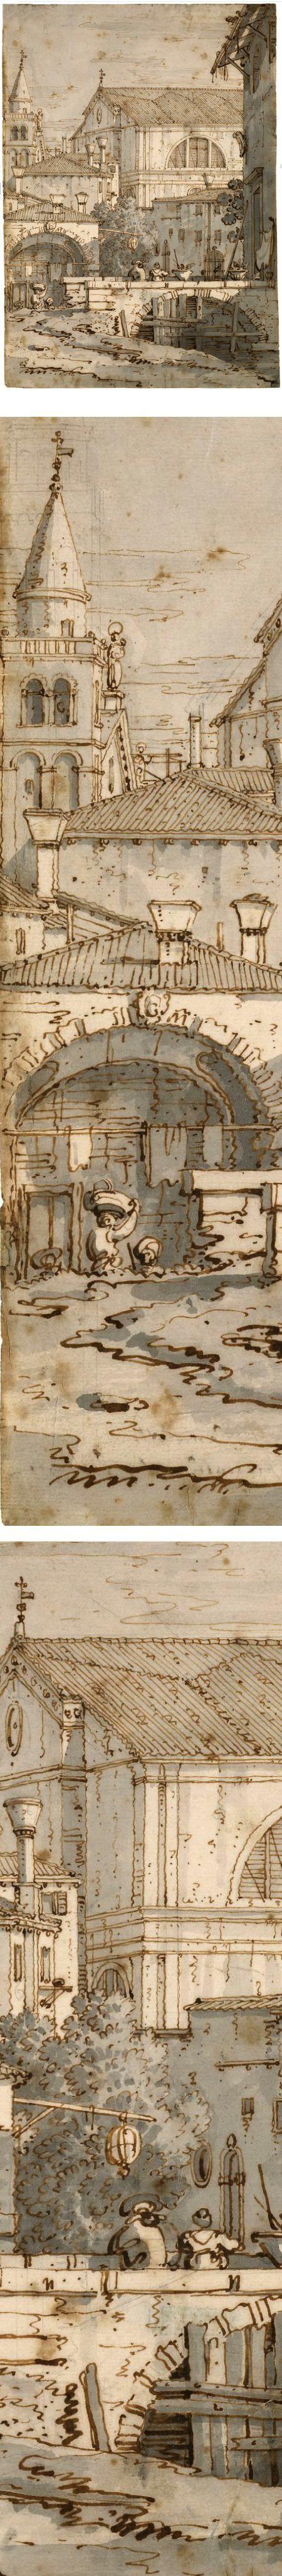 Architectural Capriccio, Canaletto (Giovanni Antonio Canal), Pen and brown ink, with gray wash, over graphite and traces of black chalk, 11 1/4 x 8 1/16 inches (286 x 204 mm) - Picmia